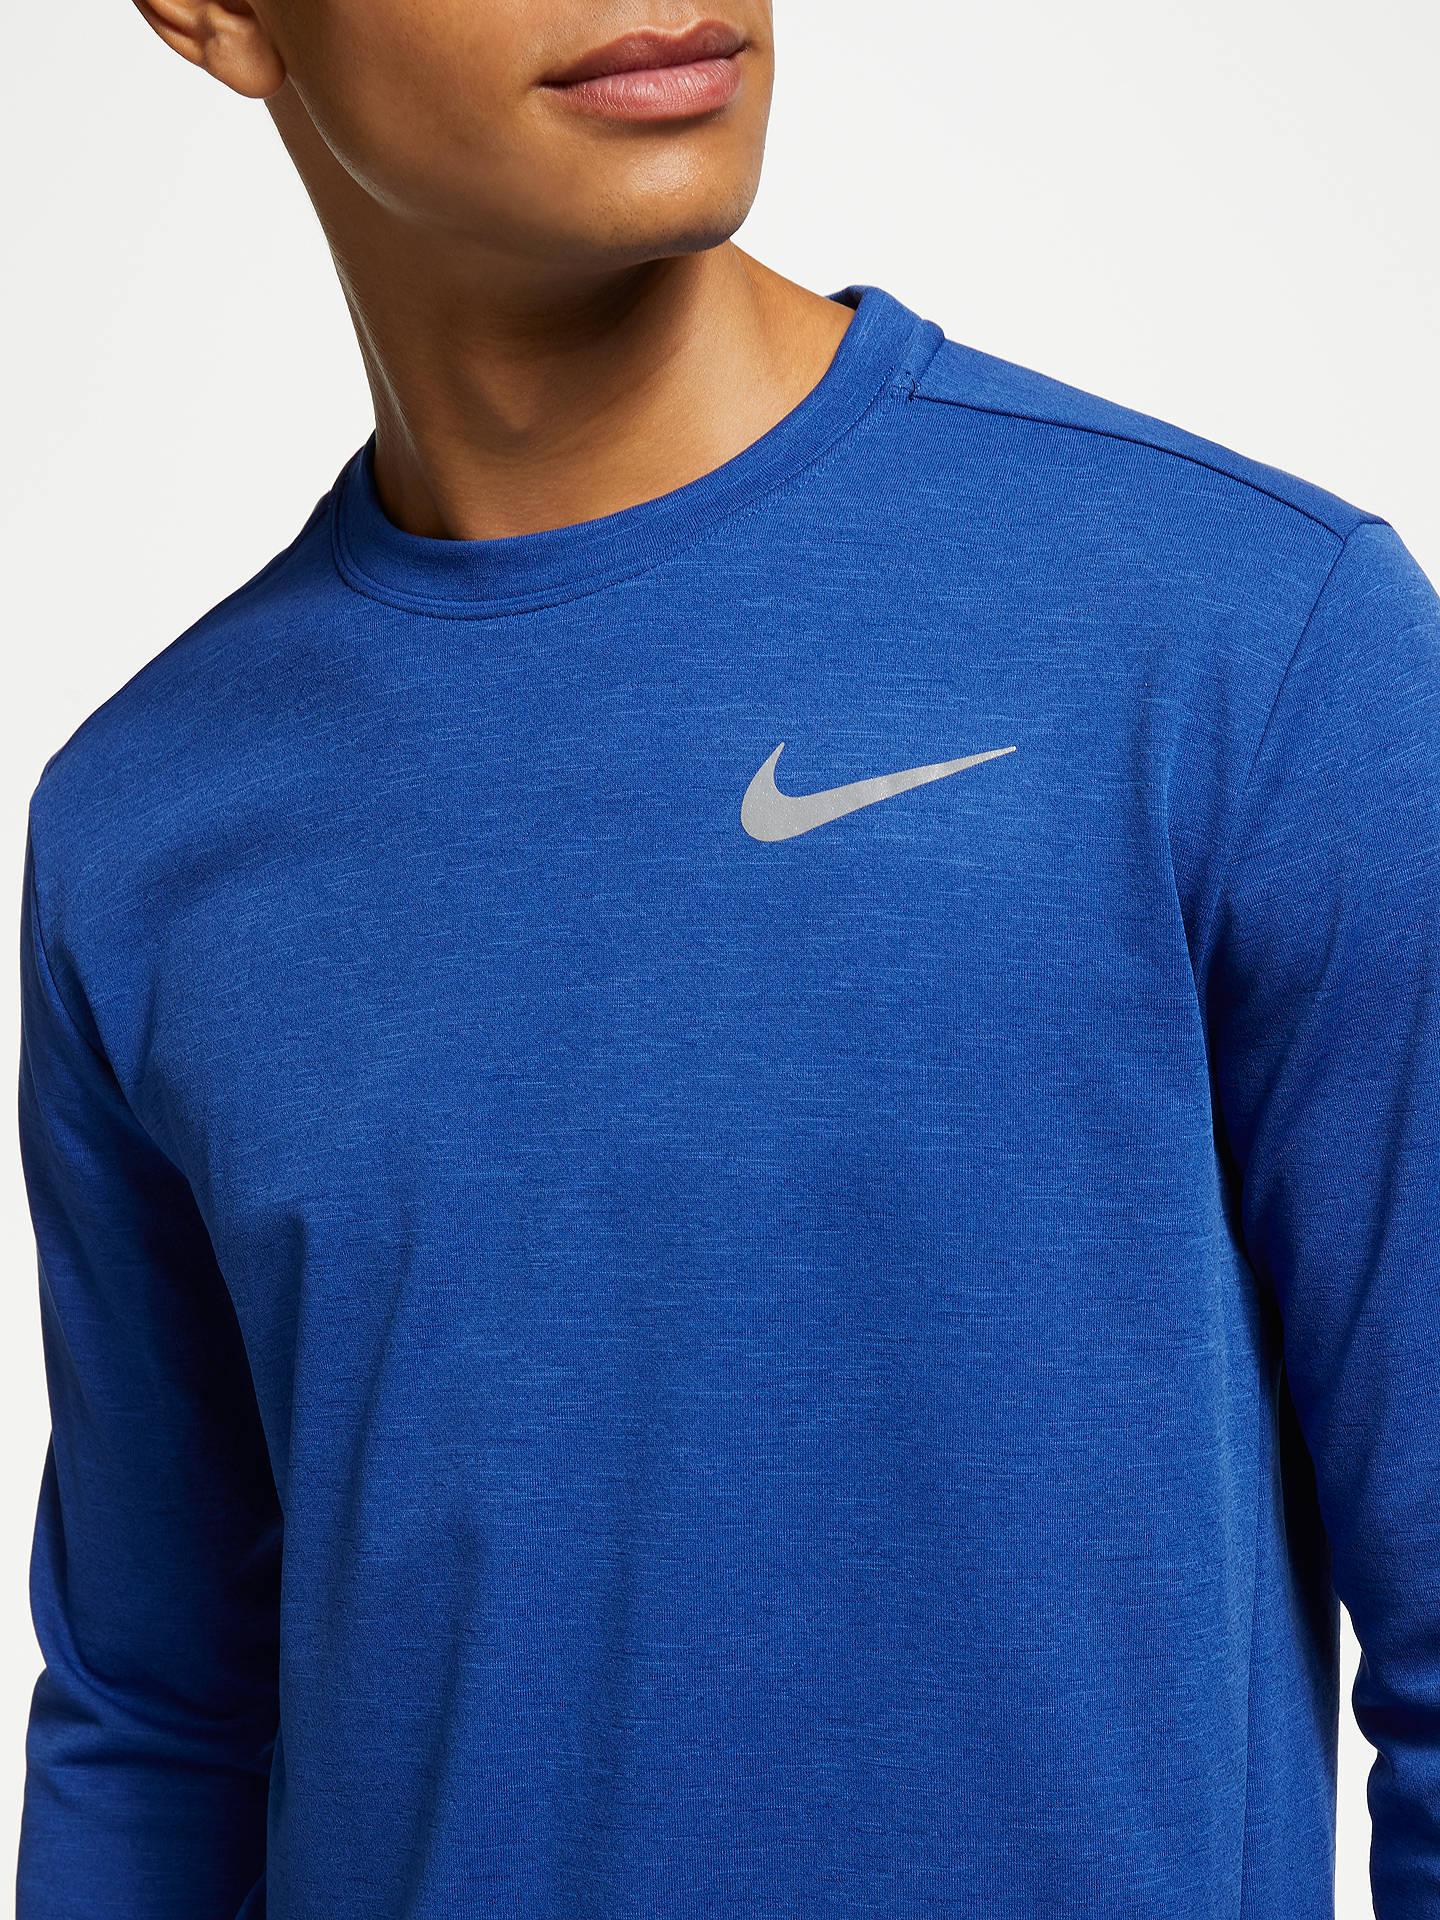 58decd74 ... Buy Nike Therma Sphere Element 2.0 Long Sleeve Running Top, Blue Void,  S Online ...